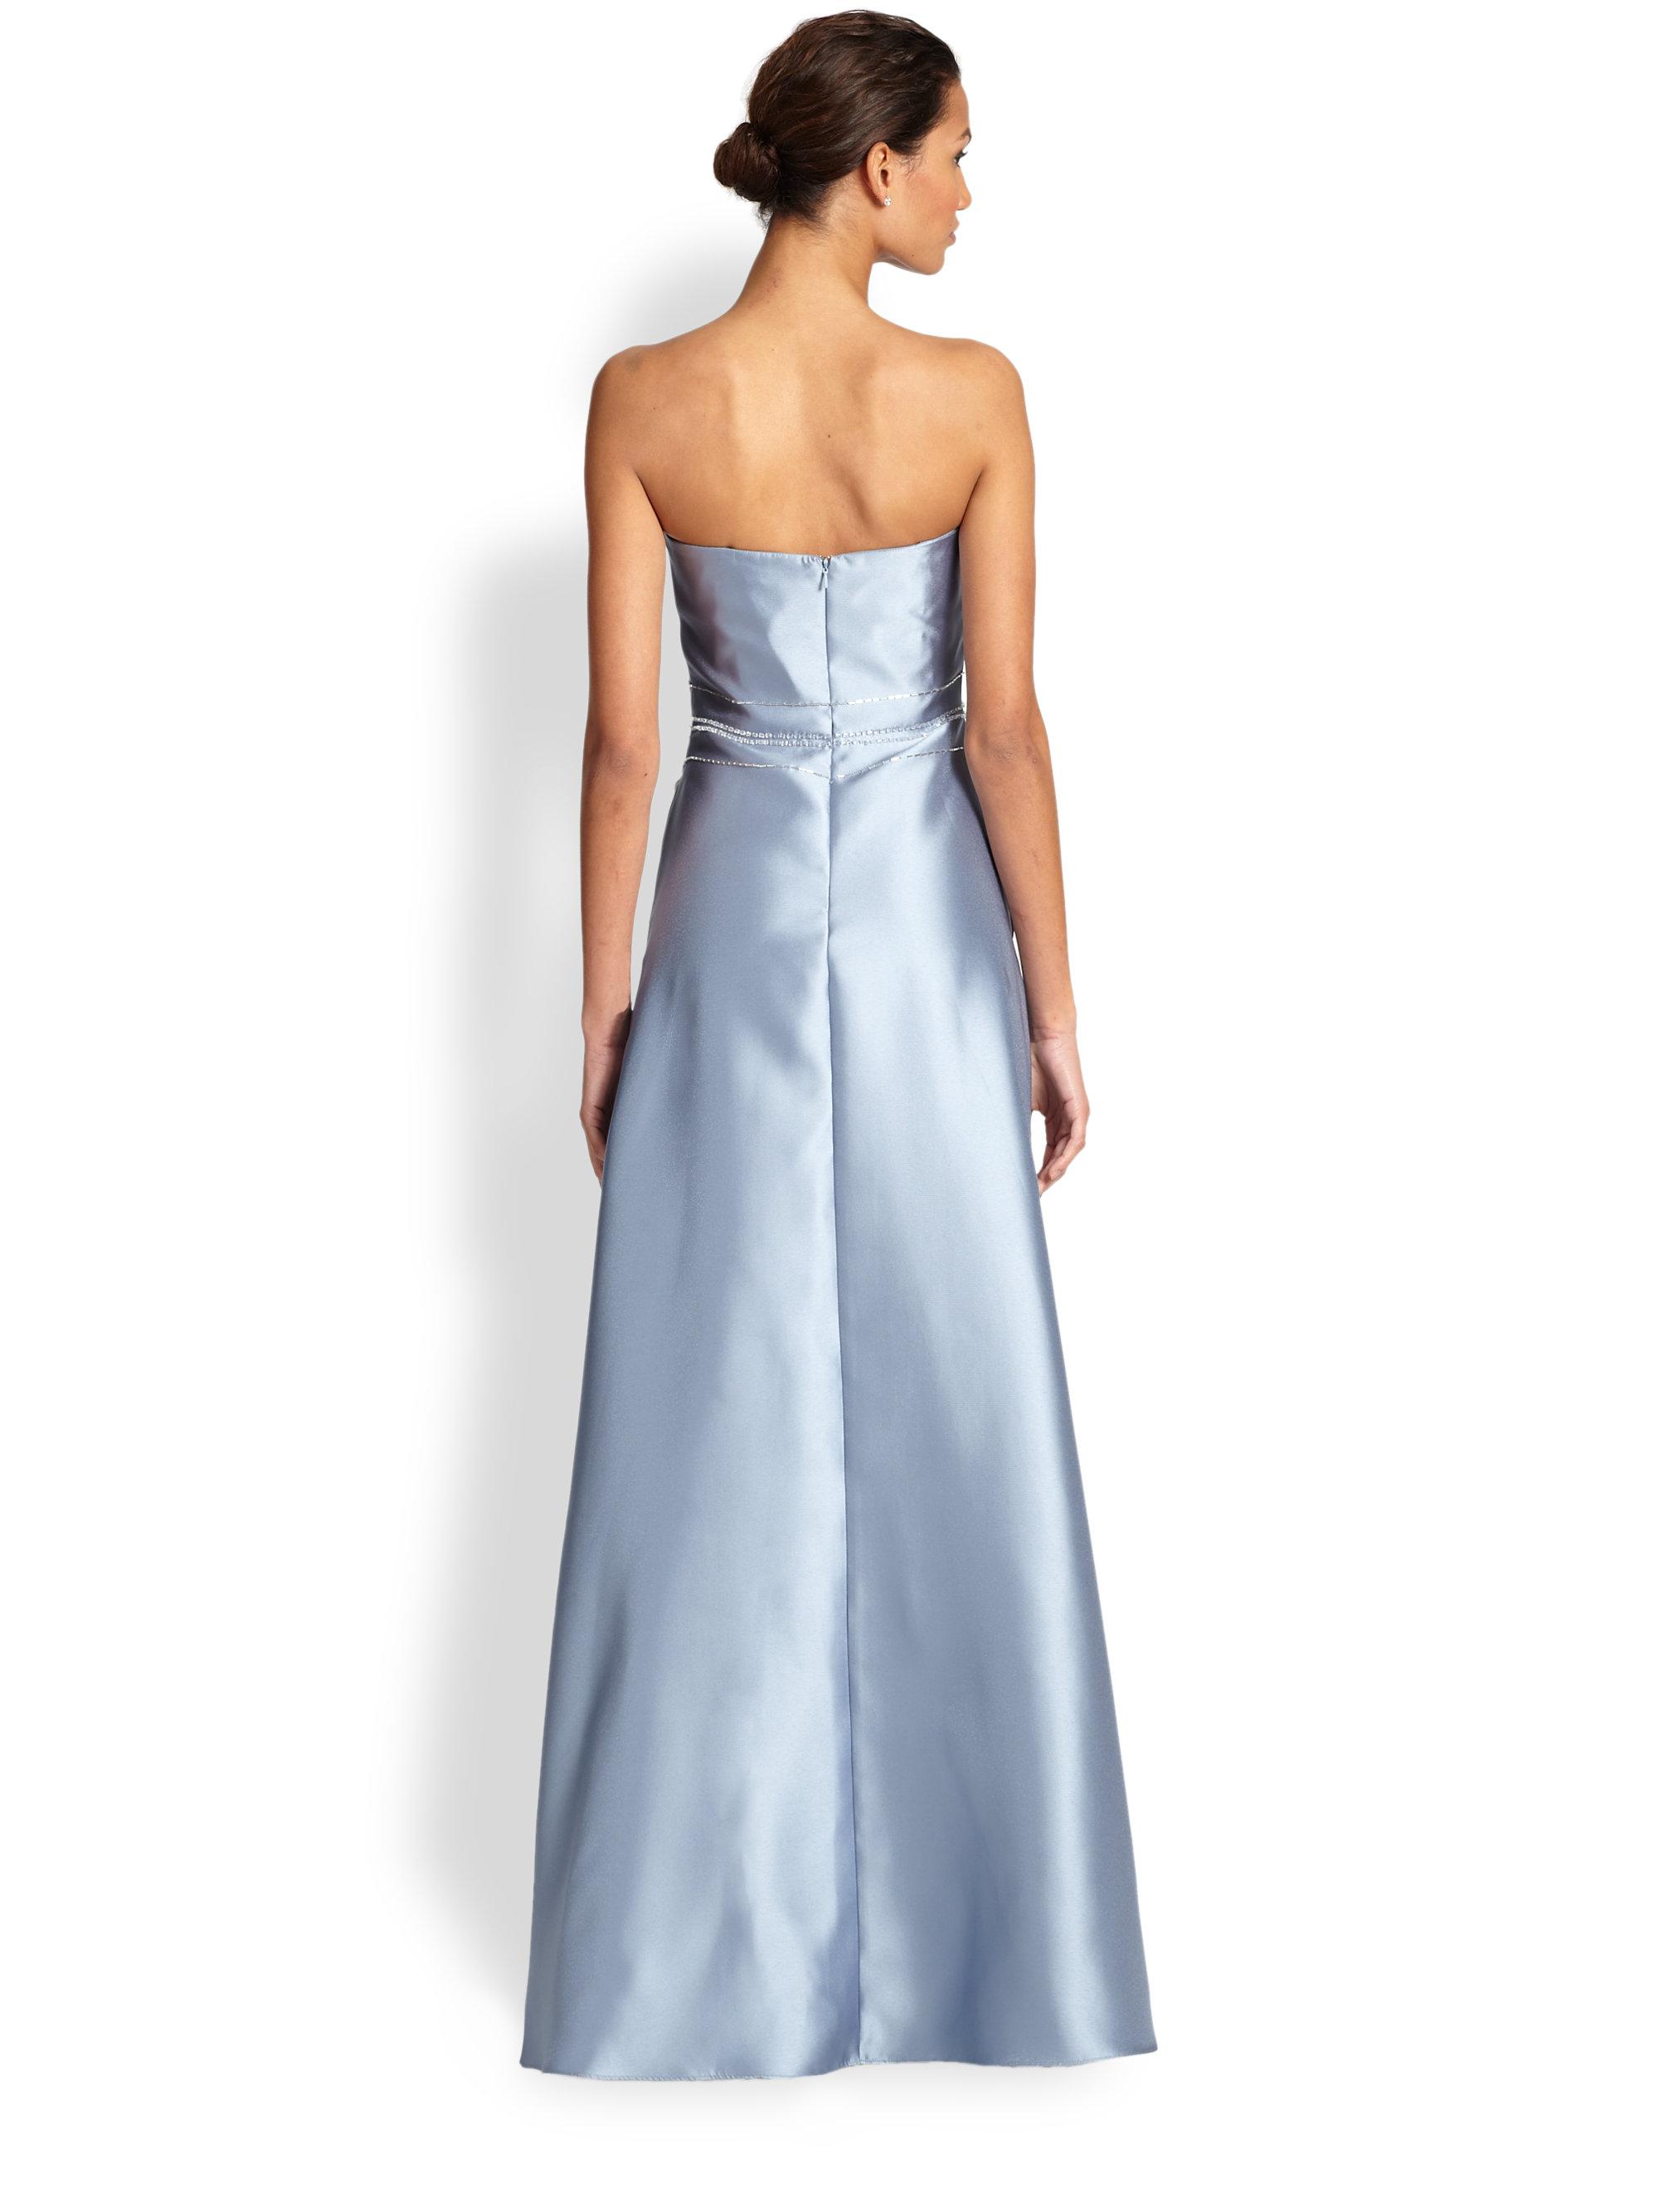 Lyst Badgley Mischka Strapless Beaded Gown In Blue